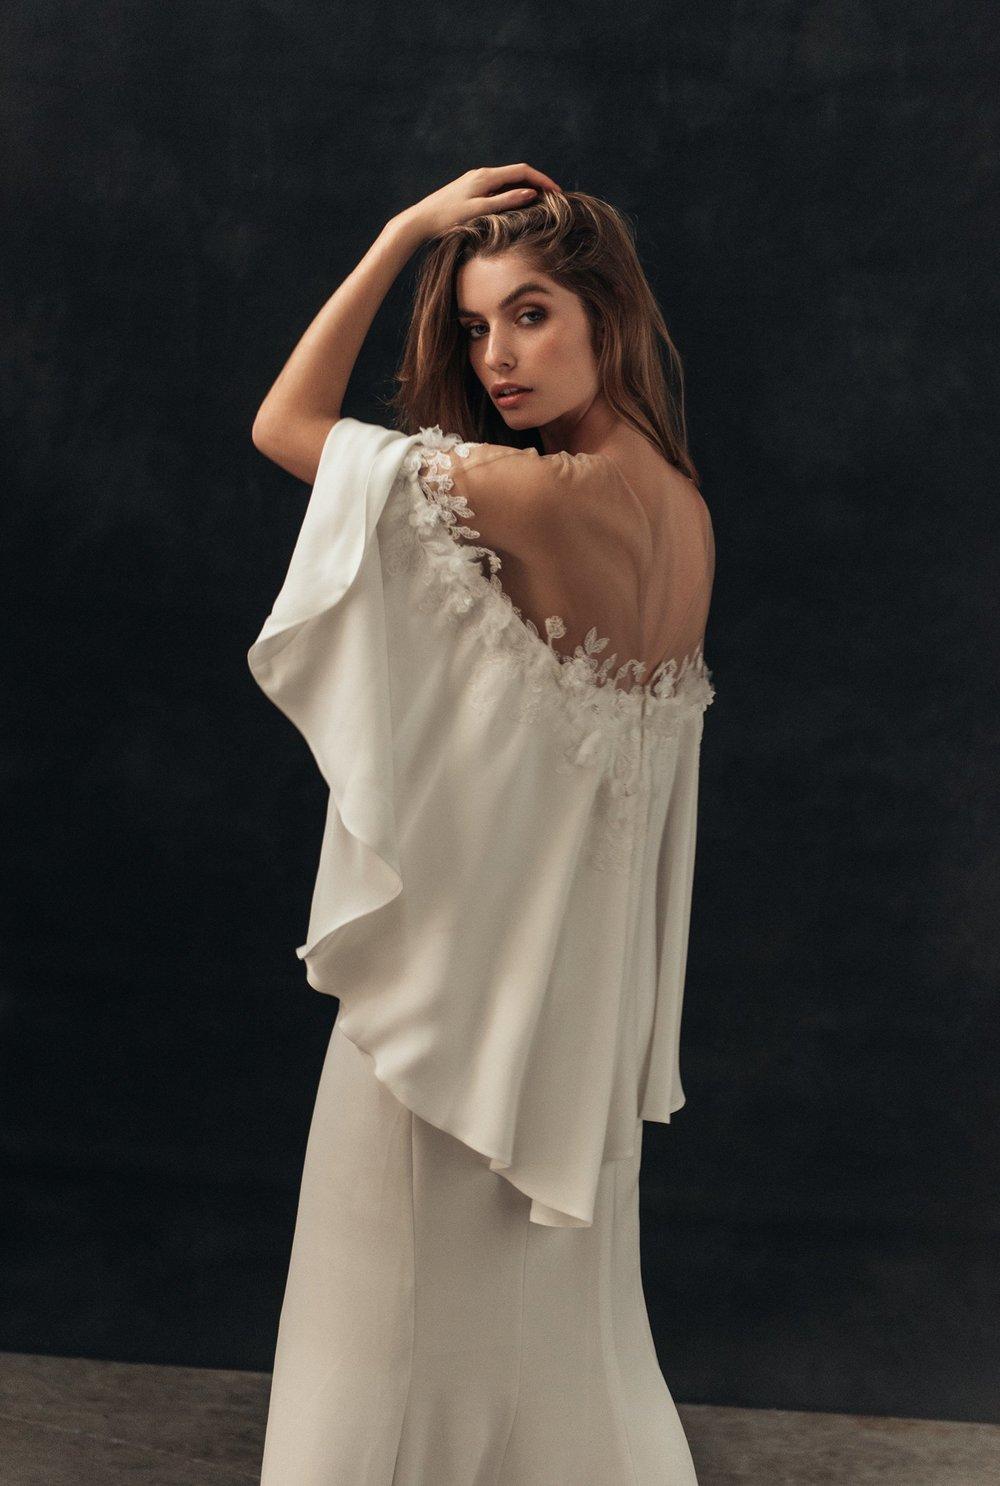 13.-hello-may-bridal-fashion-editorial-jack-steel-photography-Tadashi-Shoji-love-marie-bridal-boutique-1.jpg